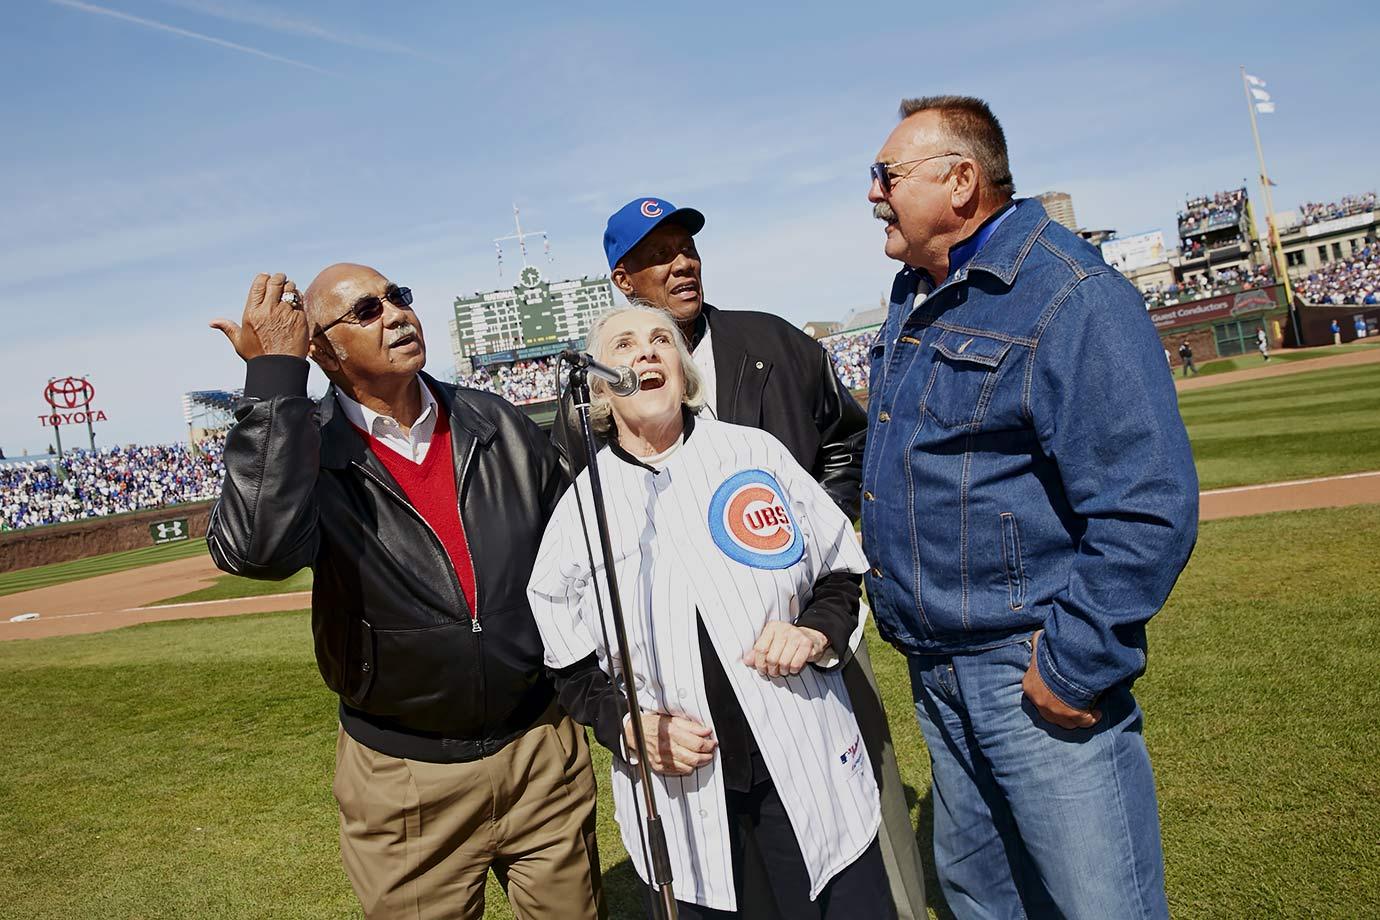 April 23, 2014 — Chicago Cubs vs. Arizona Diamondbacks